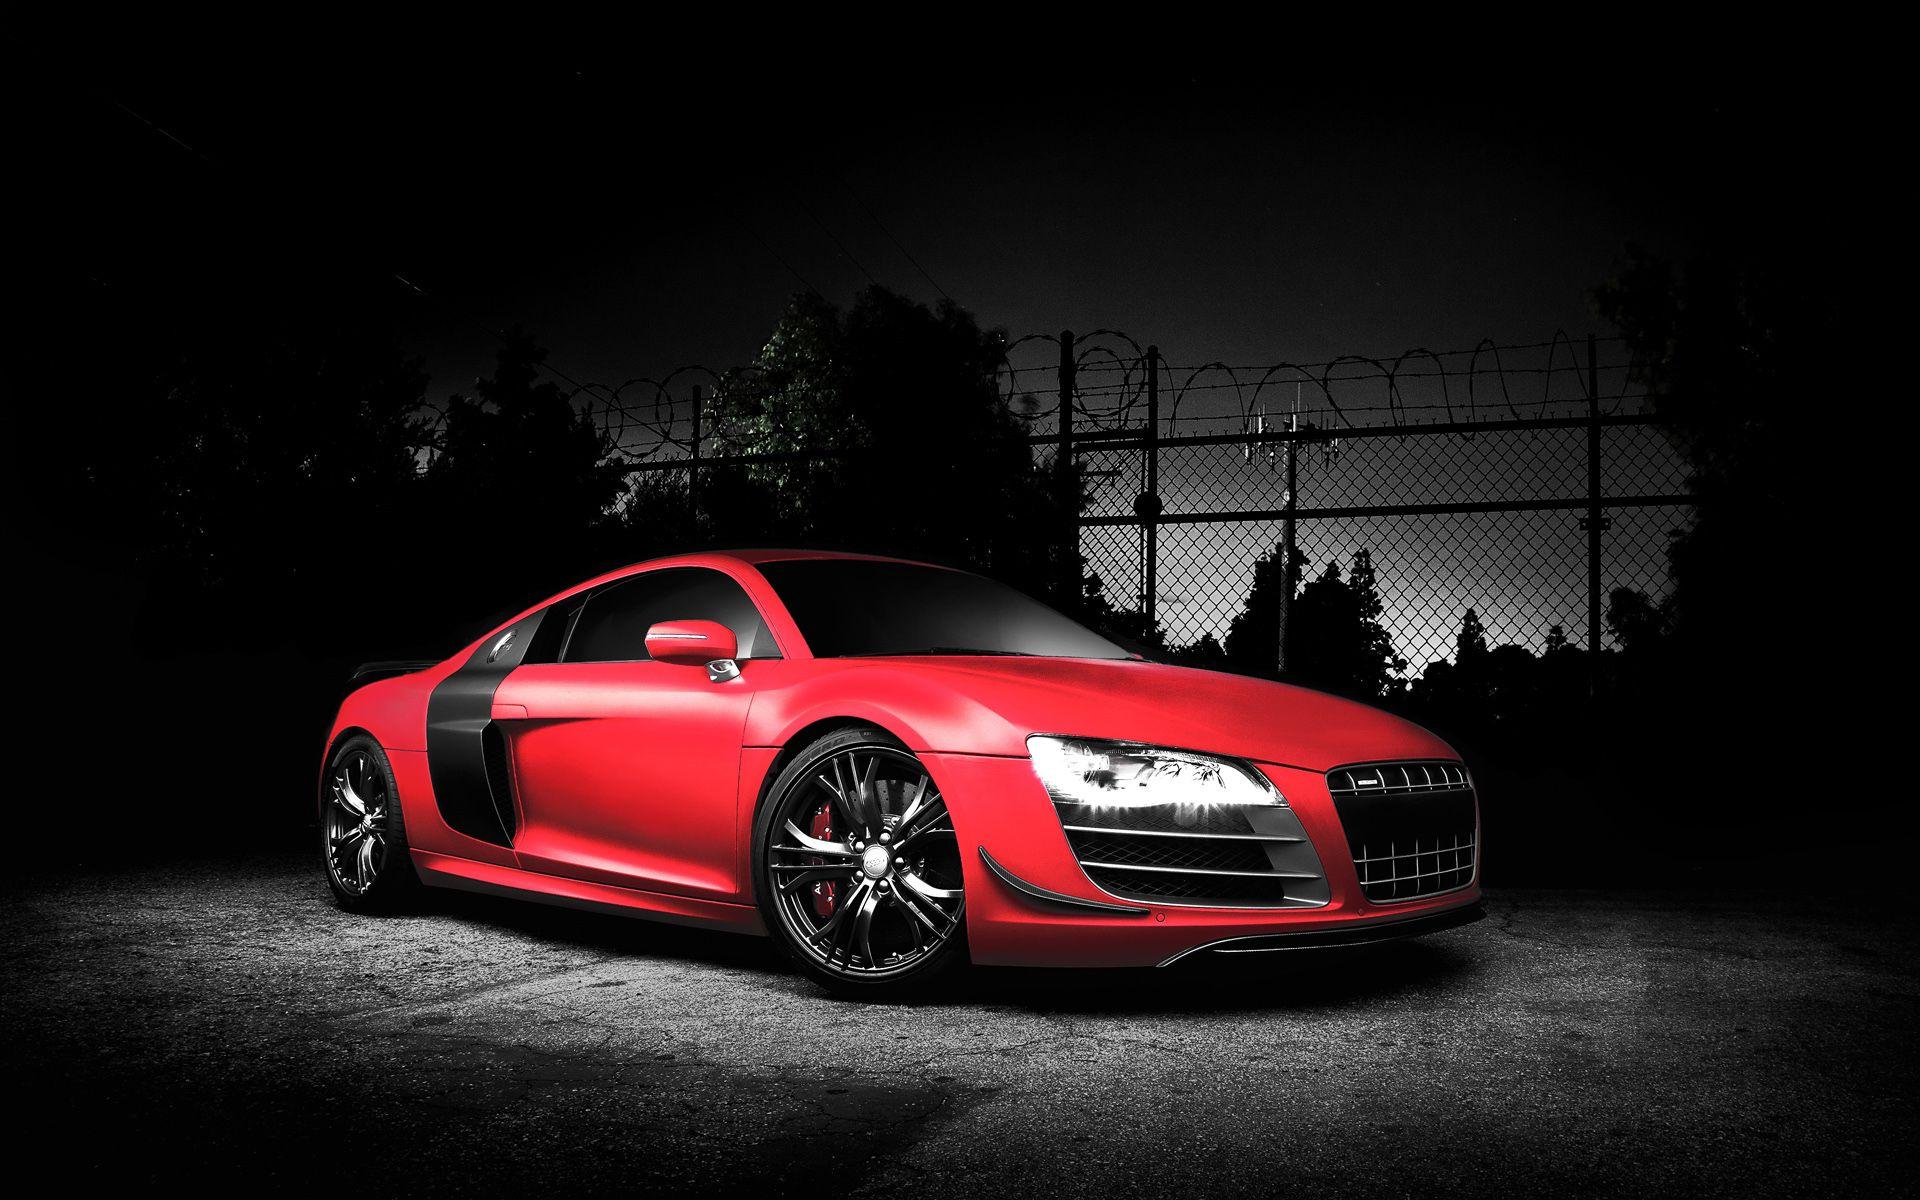 Red Audi R8 Gt Wallpaper Hd Http Imashon Com W Auto Red Audi R8